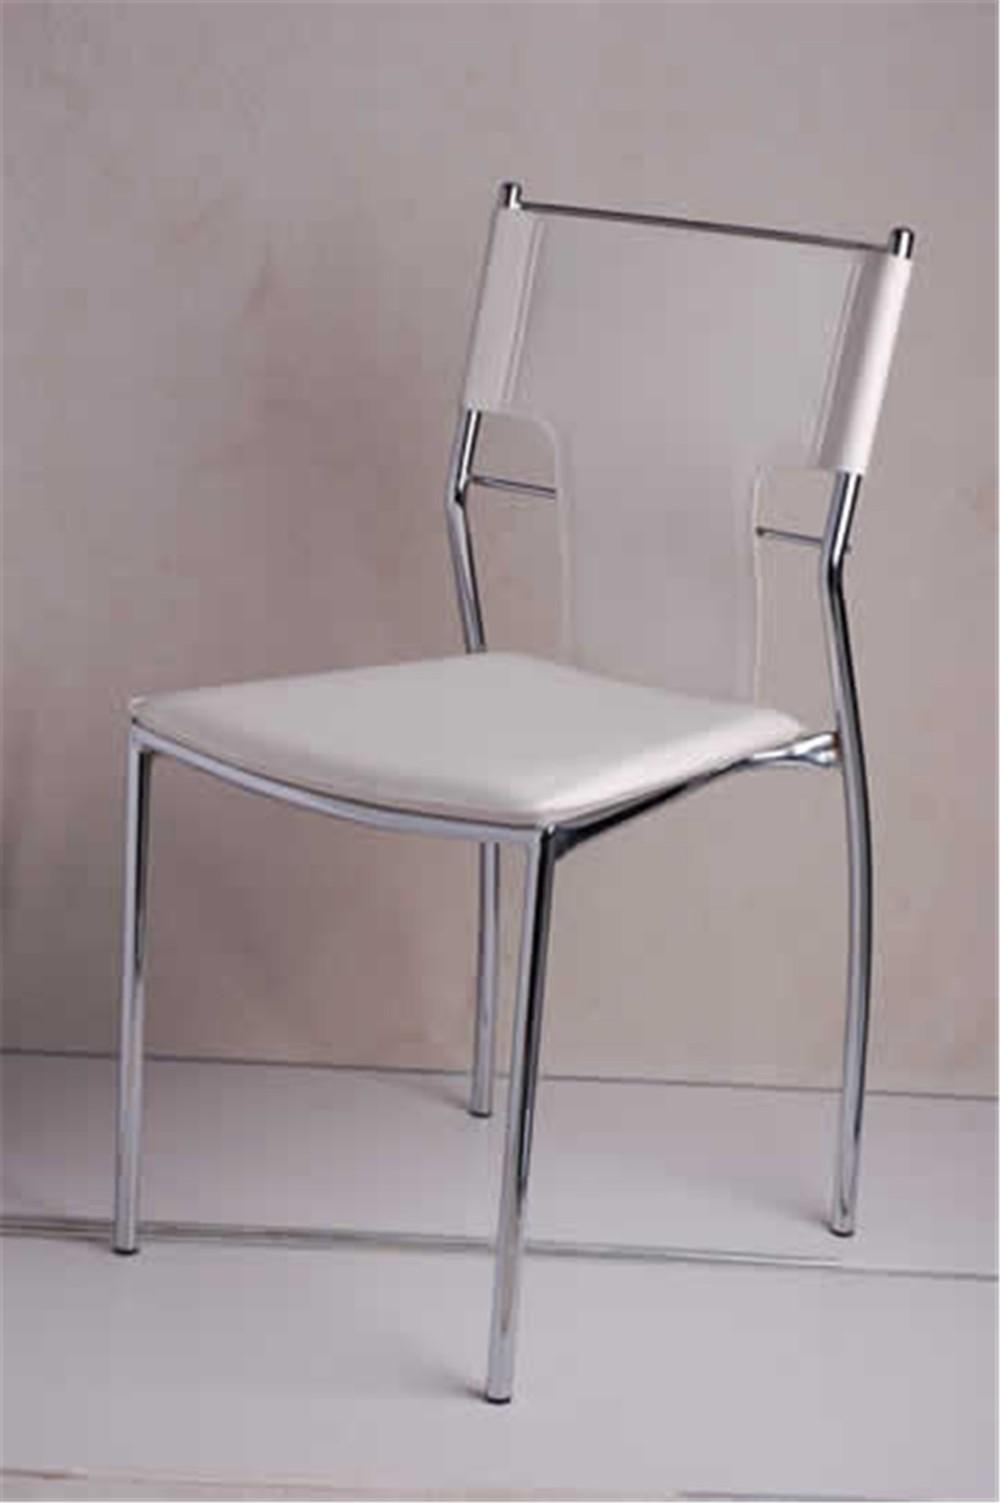 High quality modern pu office furniture chair buy for High quality modern furniture